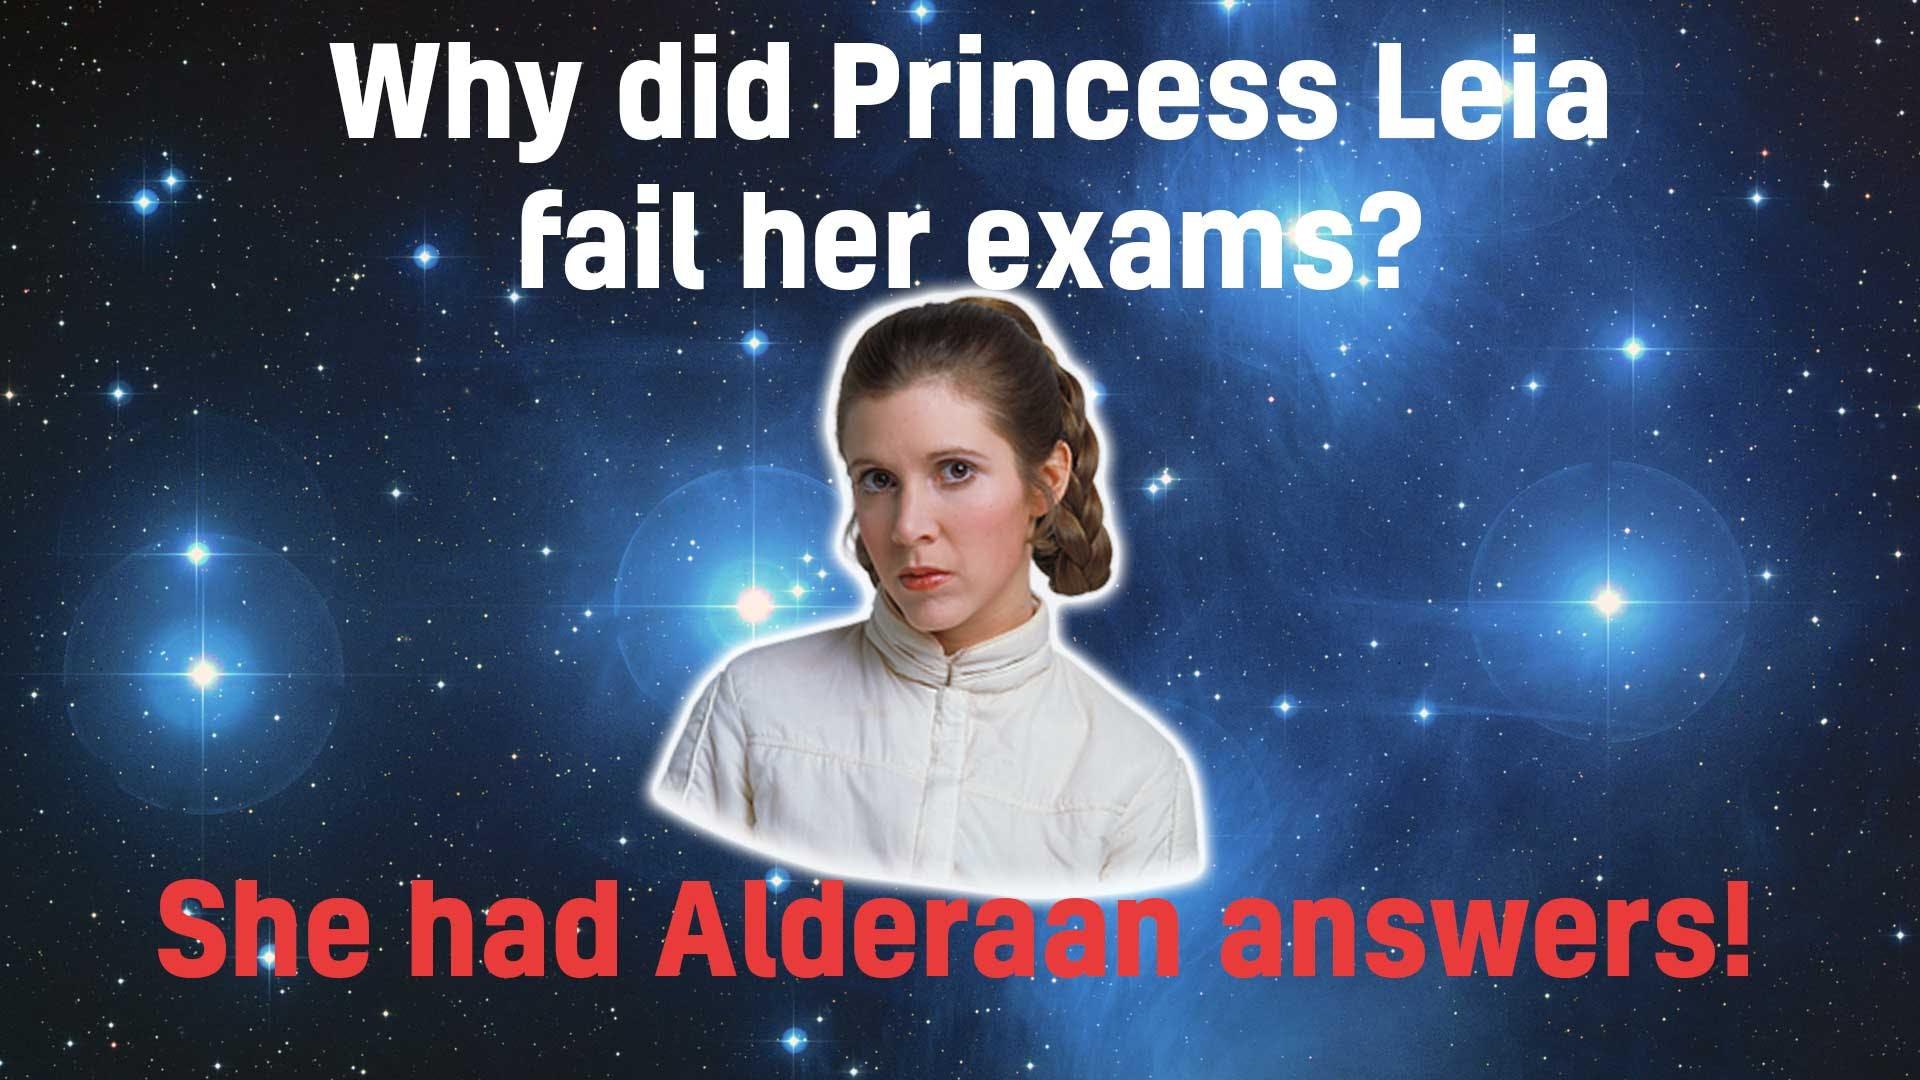 Why did Princess Leia fail her exams?